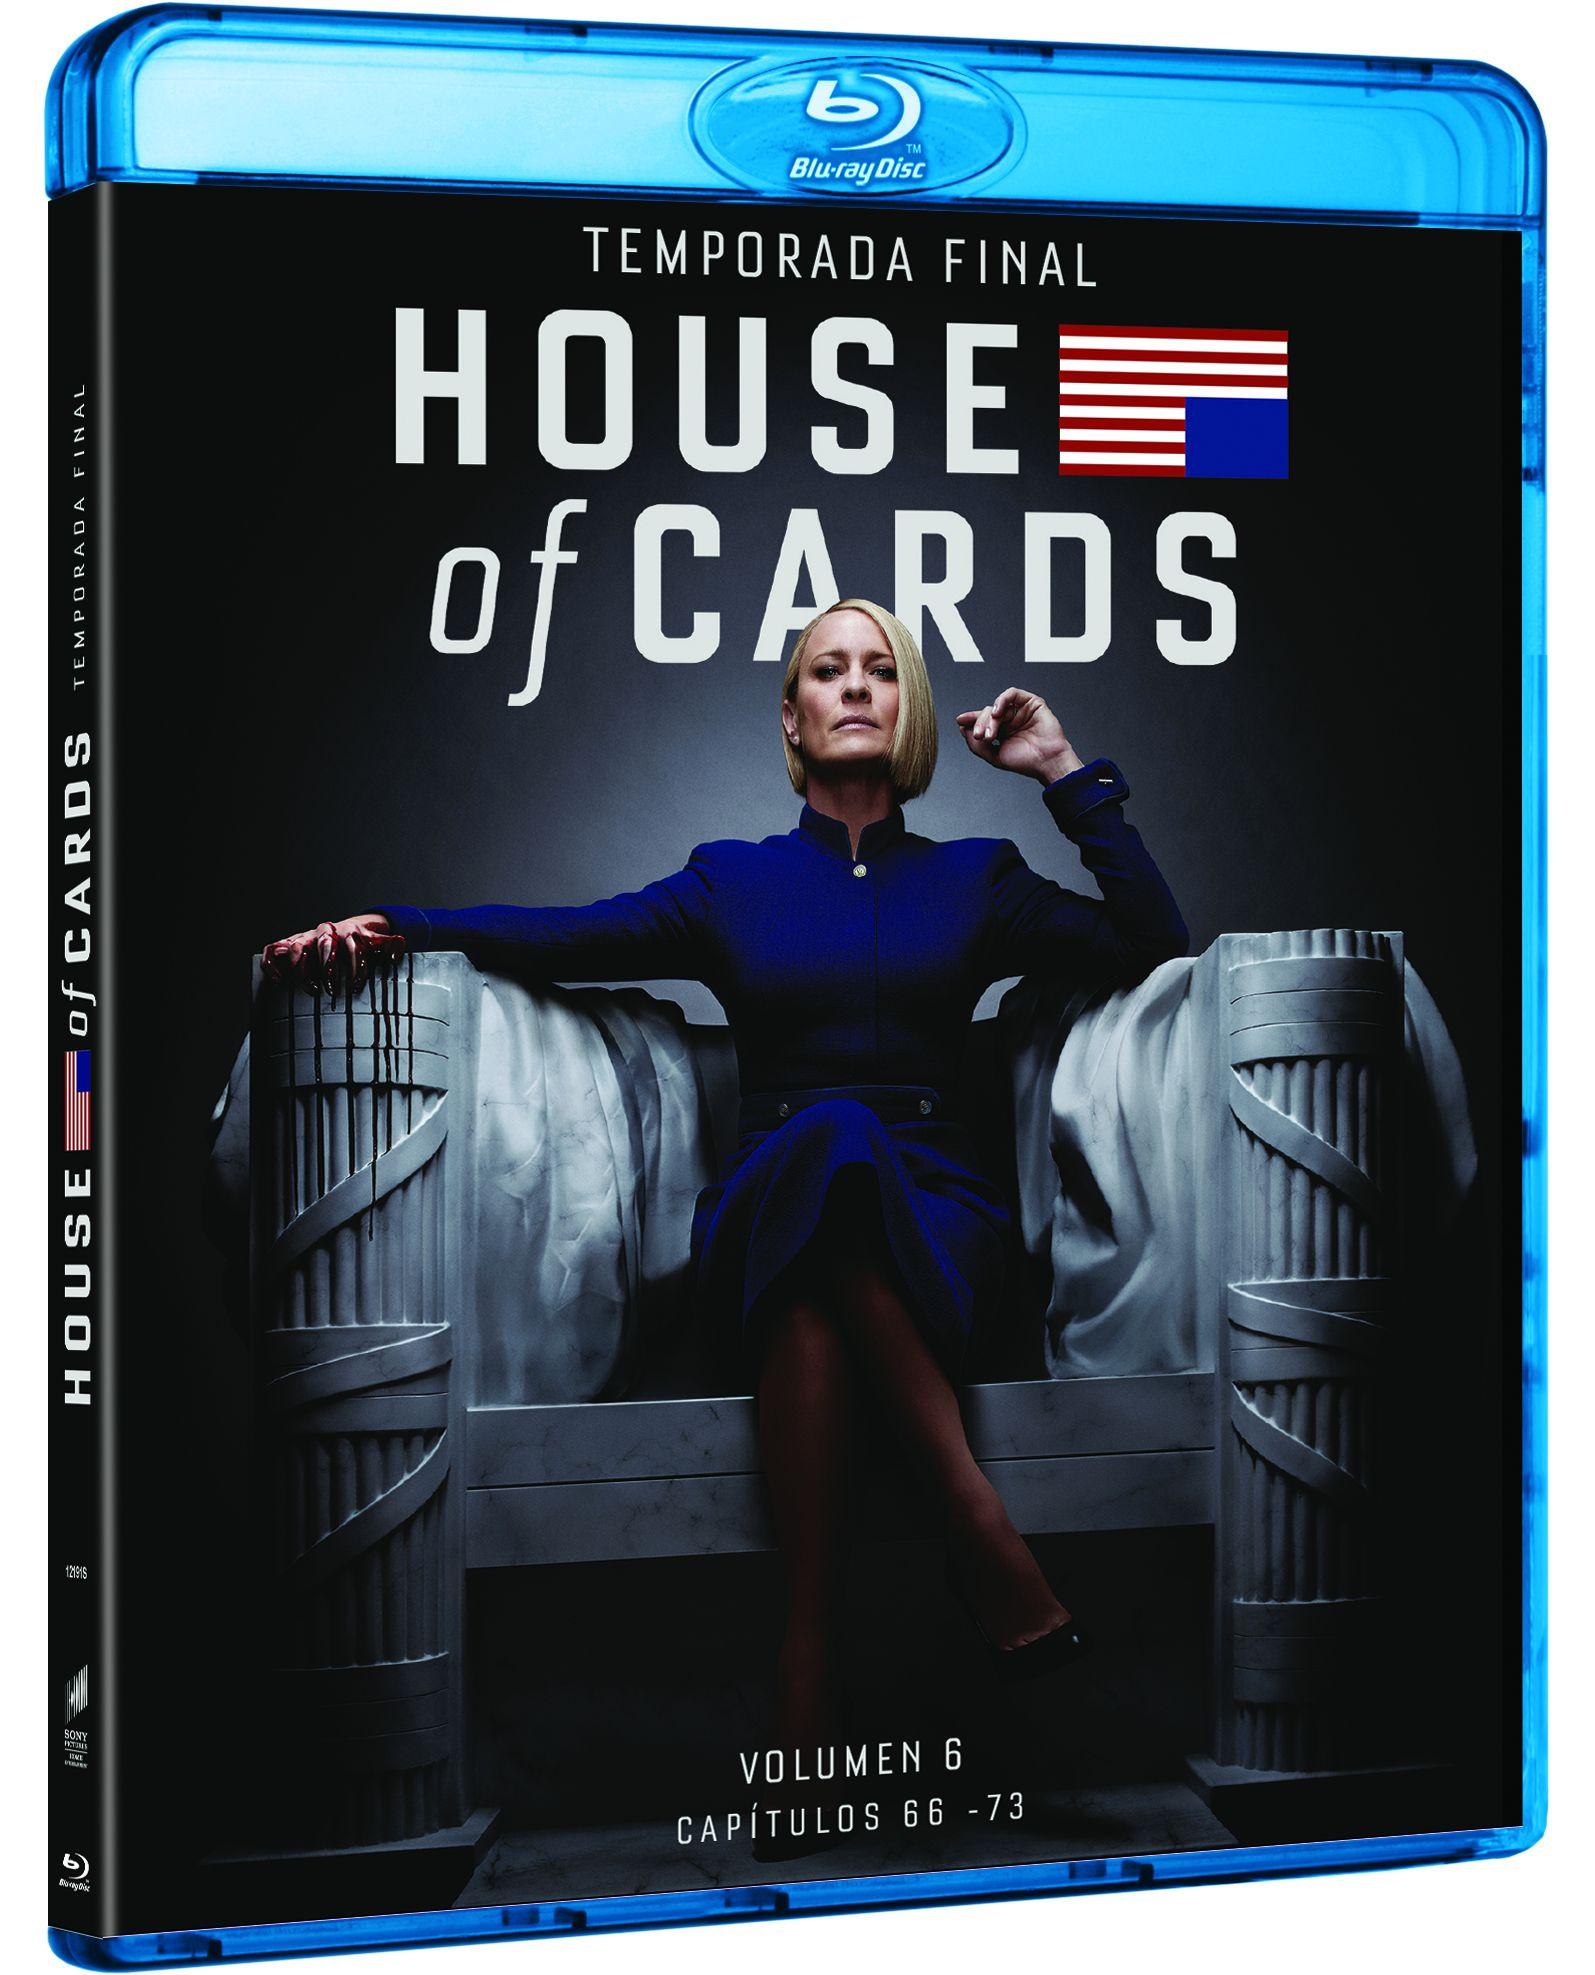 house of cards - blu ray - temporada 6-8414533121910